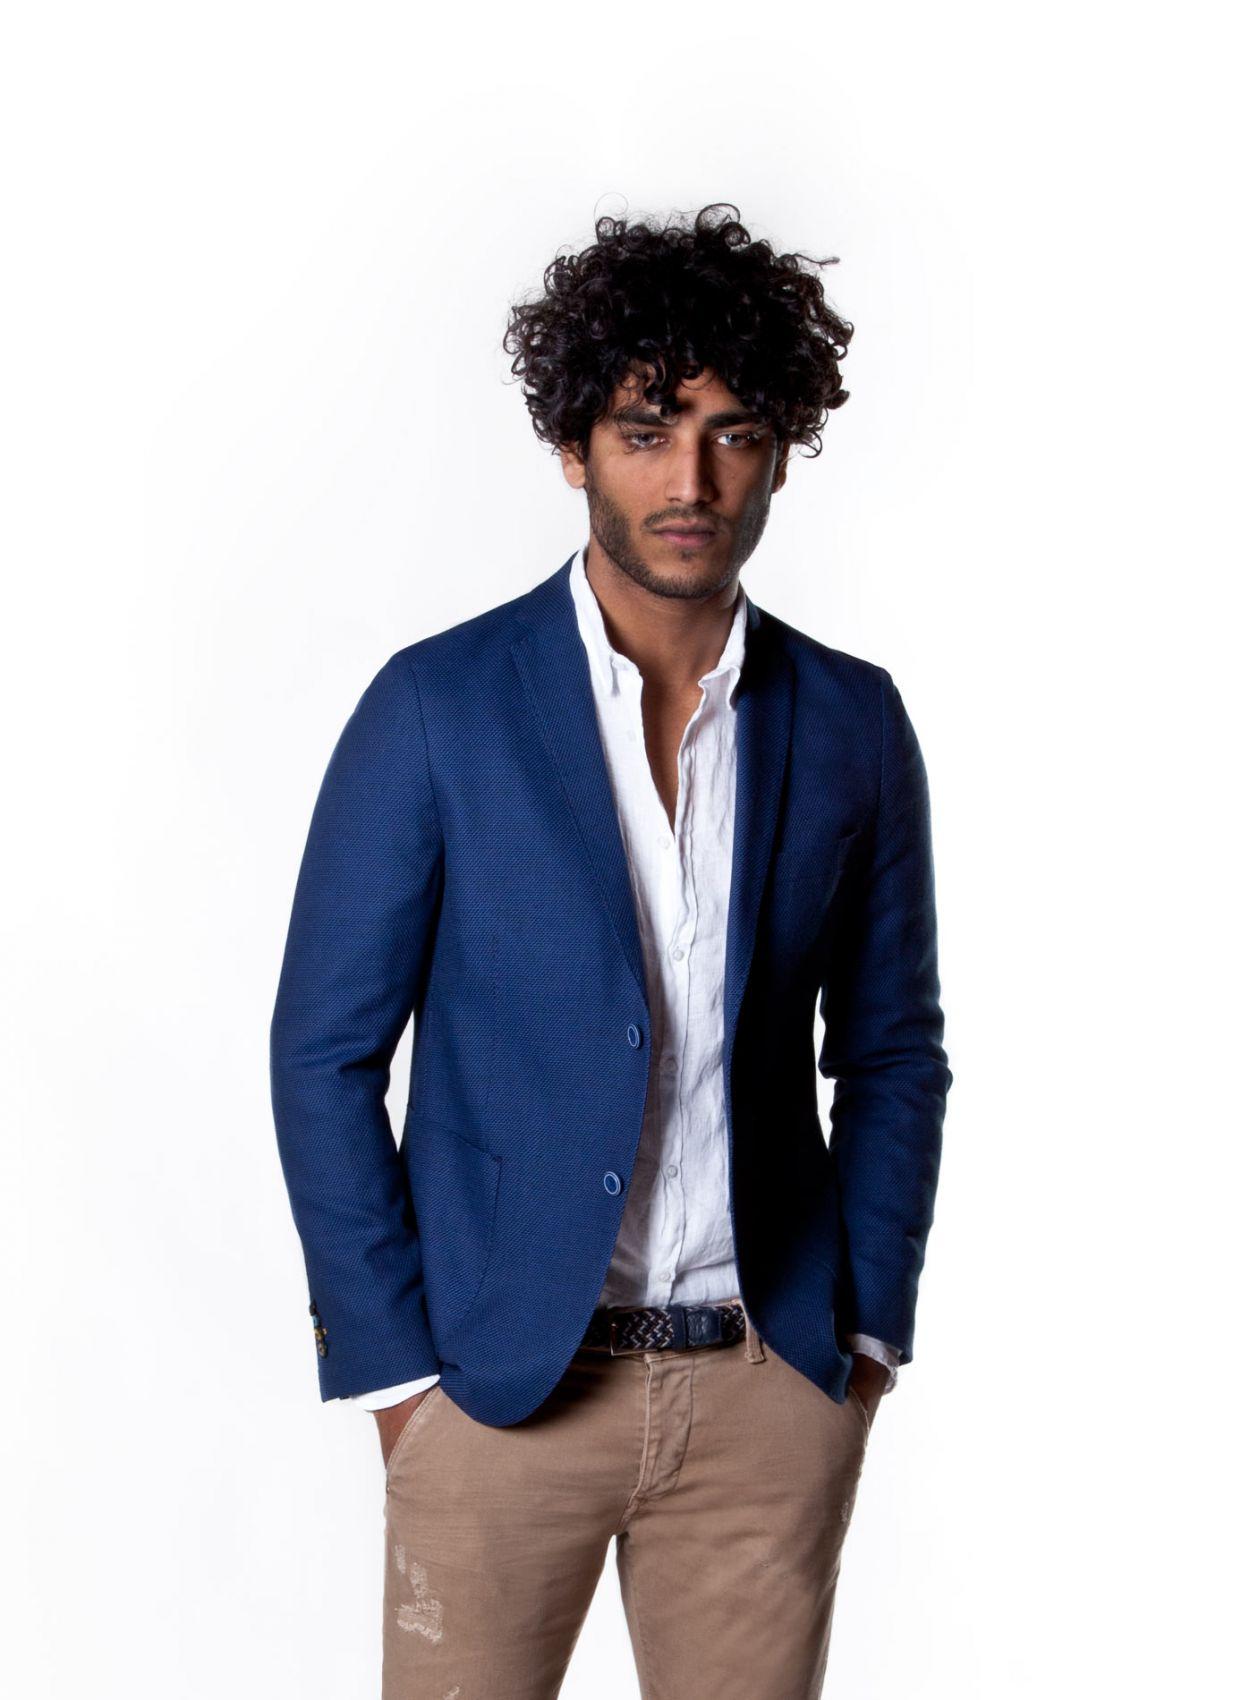 13ebec6683cc4 Fashion linen cotton slim fit jacket John Barritt tiny patterns ...